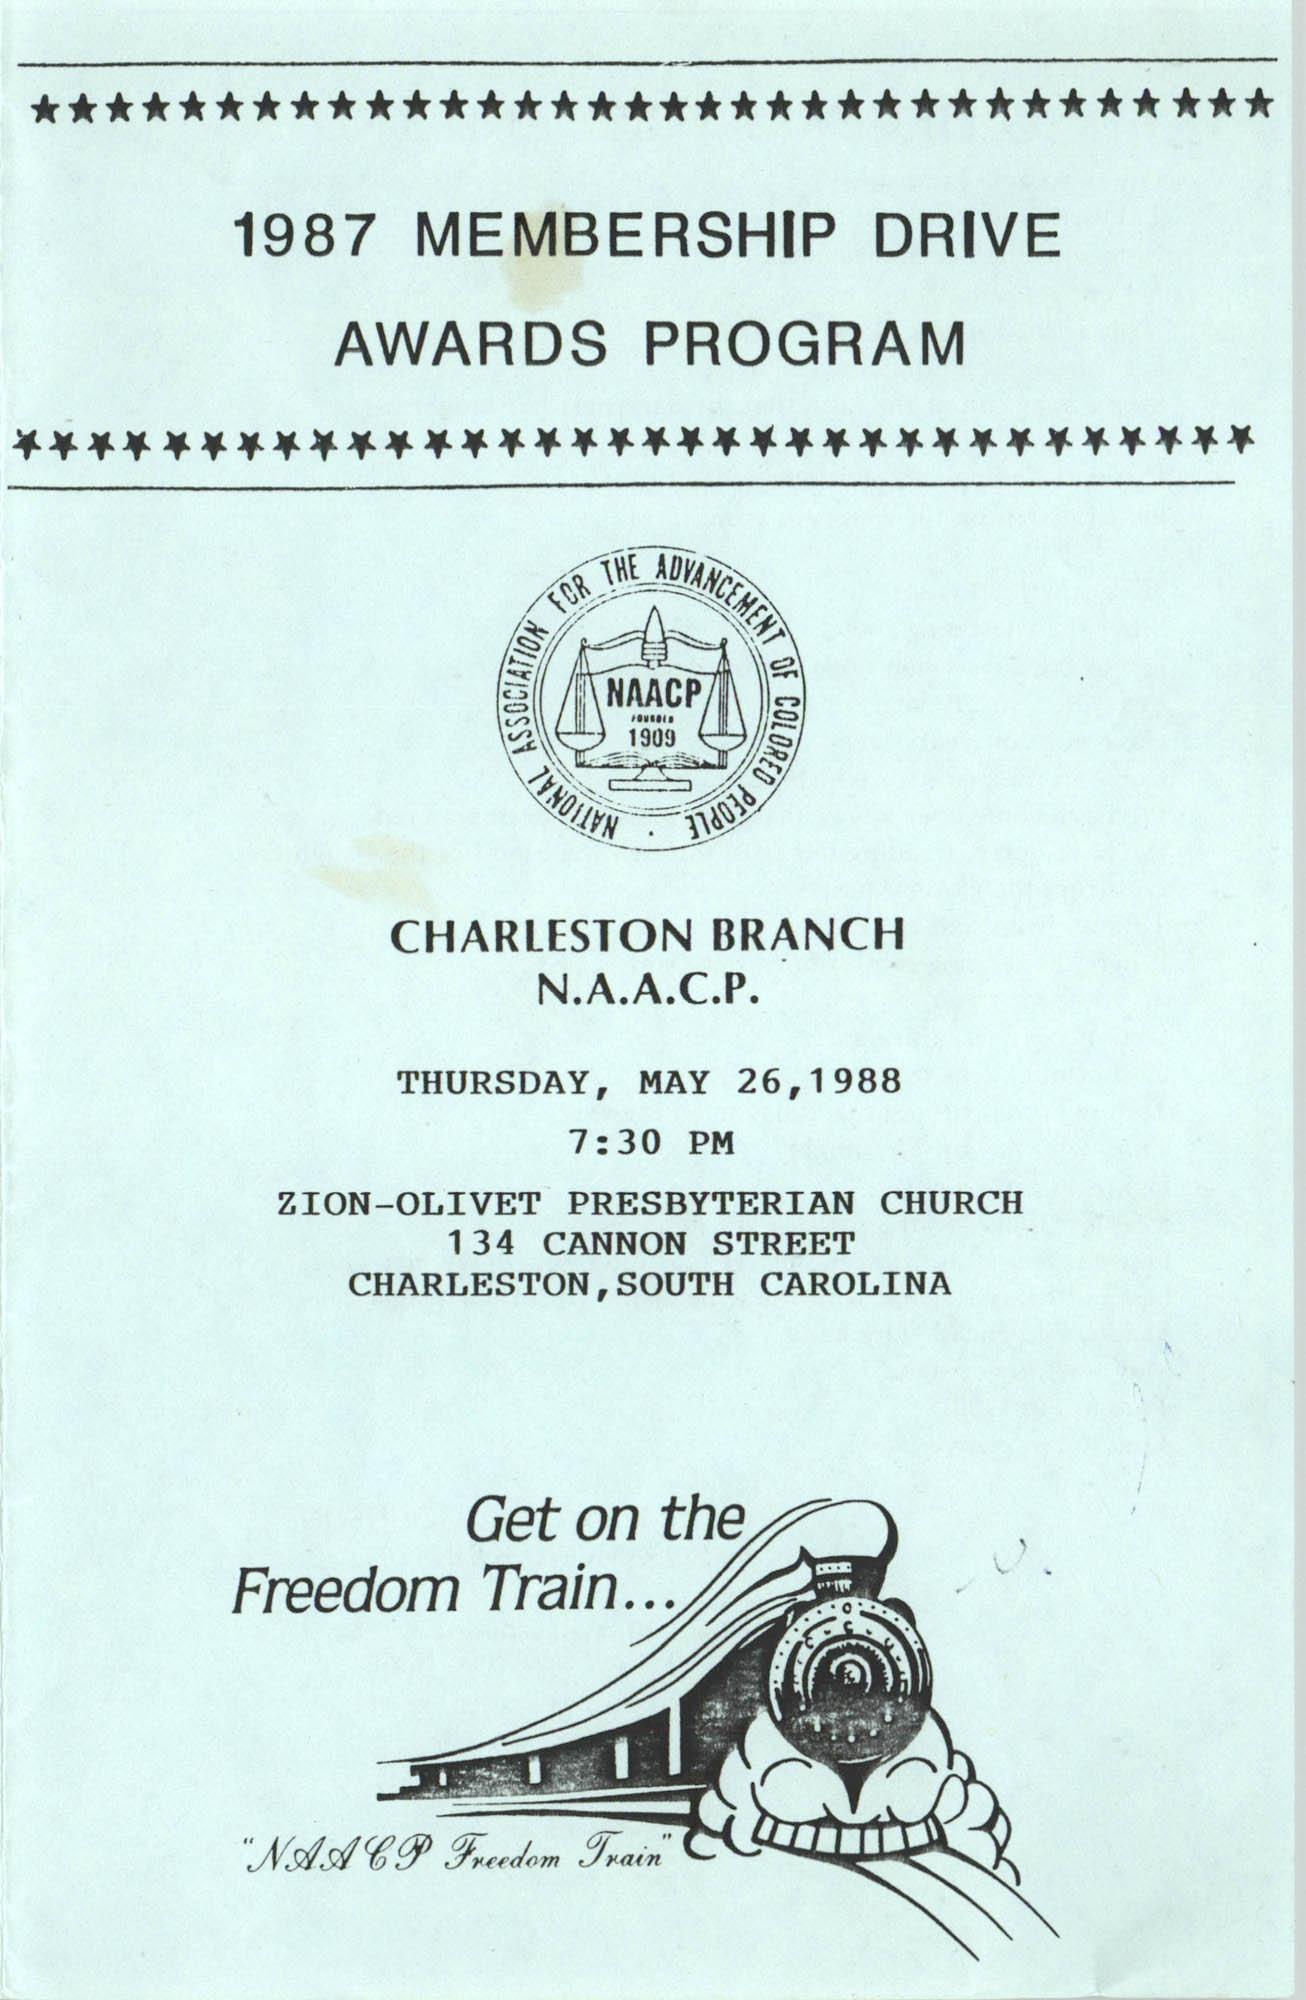 1987 Membership Drive Awards Program, Brochure, Charleston Branch of the NAACP, May 26, 1988